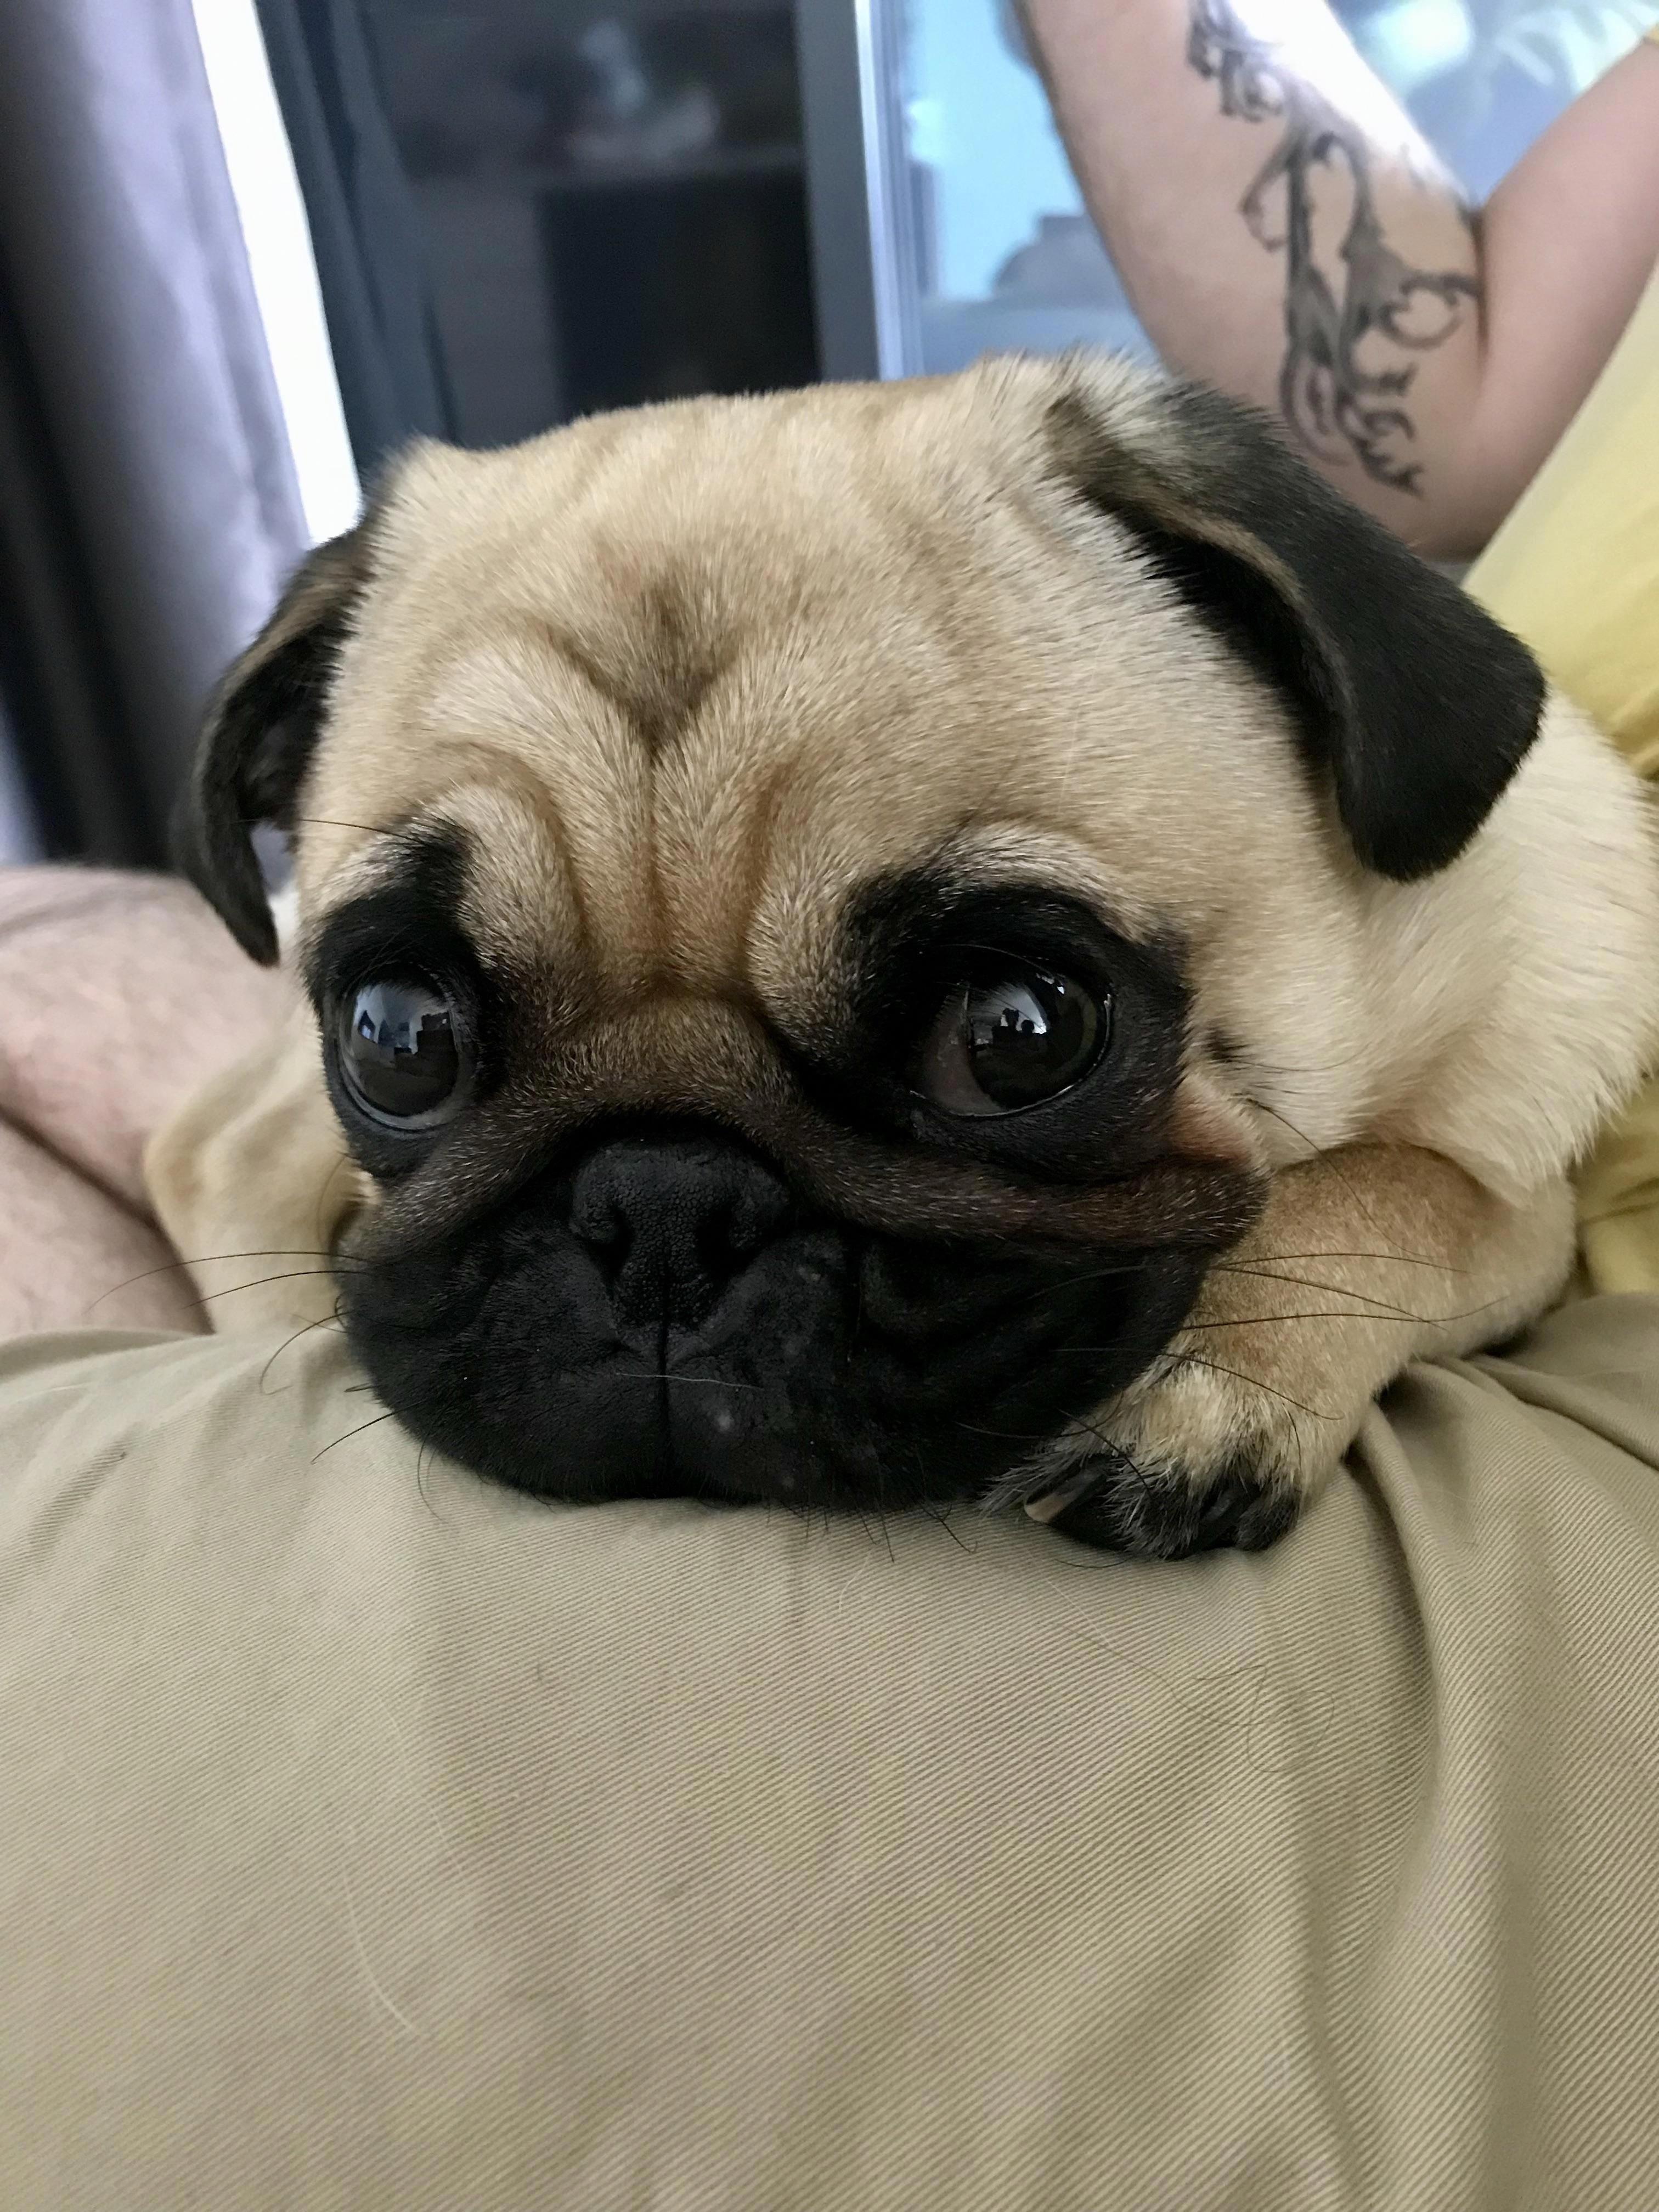 Baby Pug Dog Price In Delhi Baby Pug Dog Baby Pugs